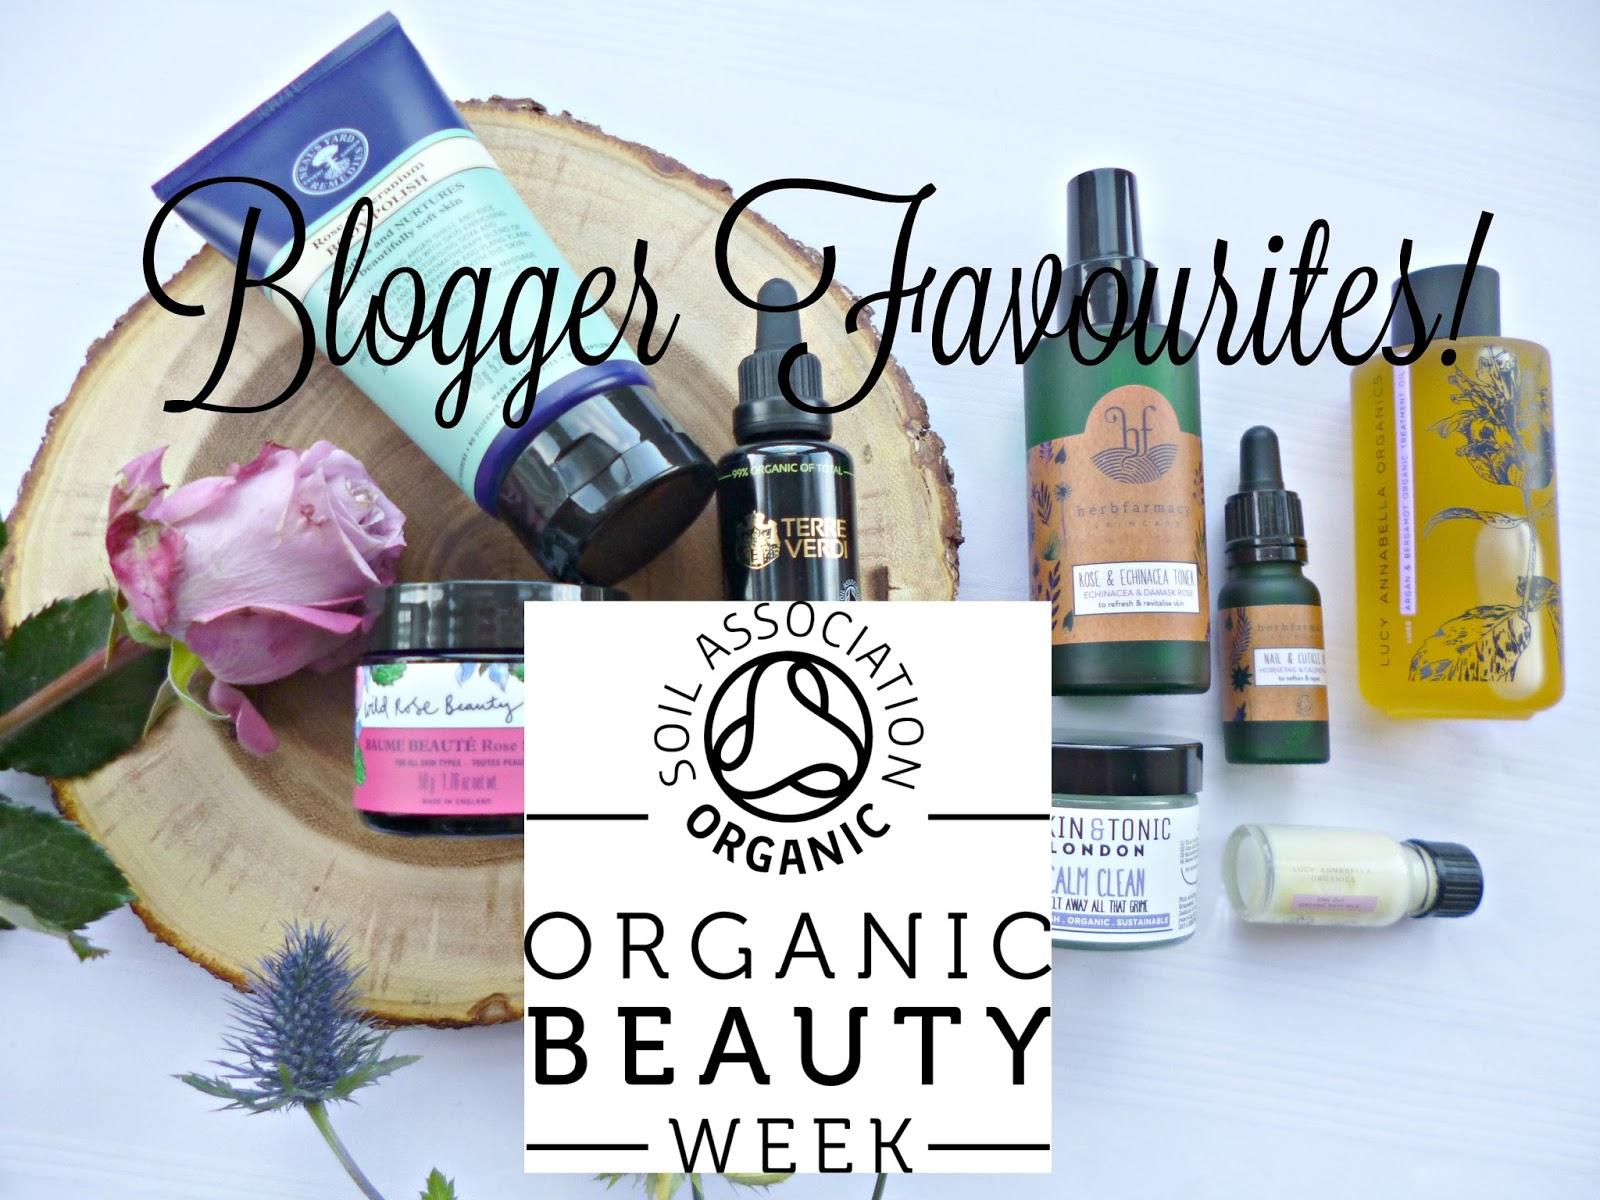 Organic Beauty week: Blogger favourites